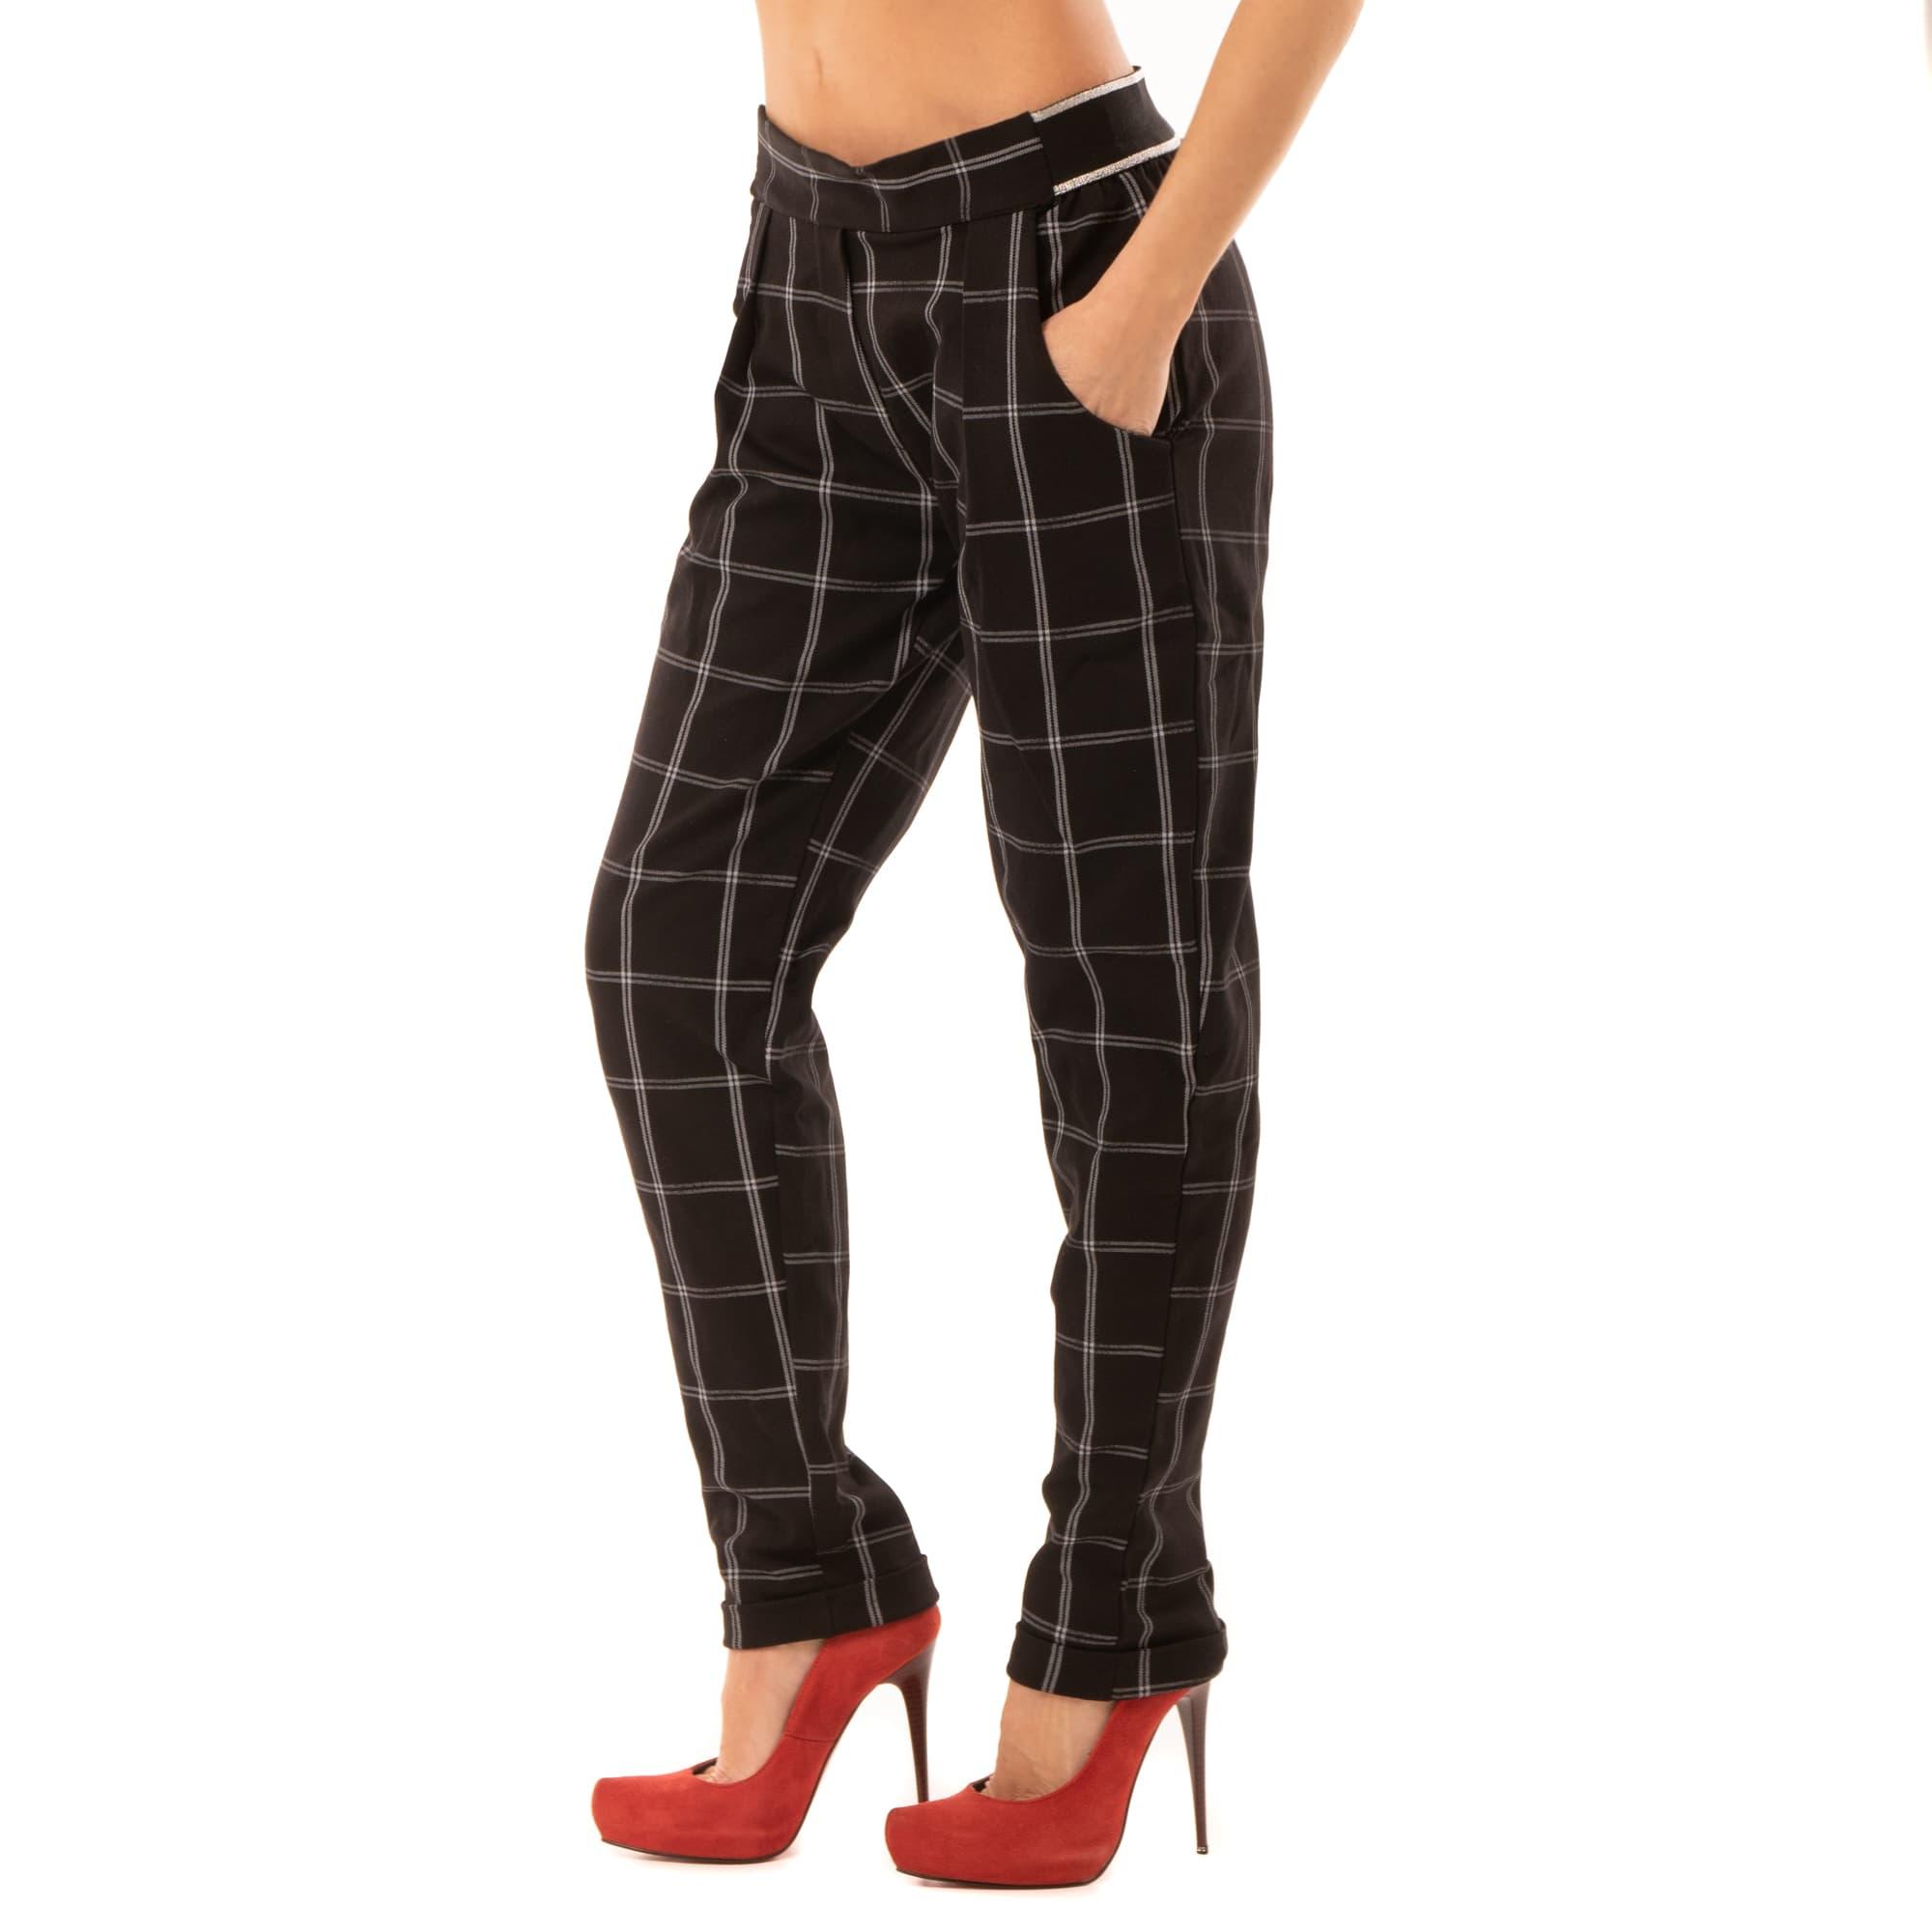 4eb63bd23a2d Dámska móda a doplnky - Elegantné kárované nohavice s lemom ...